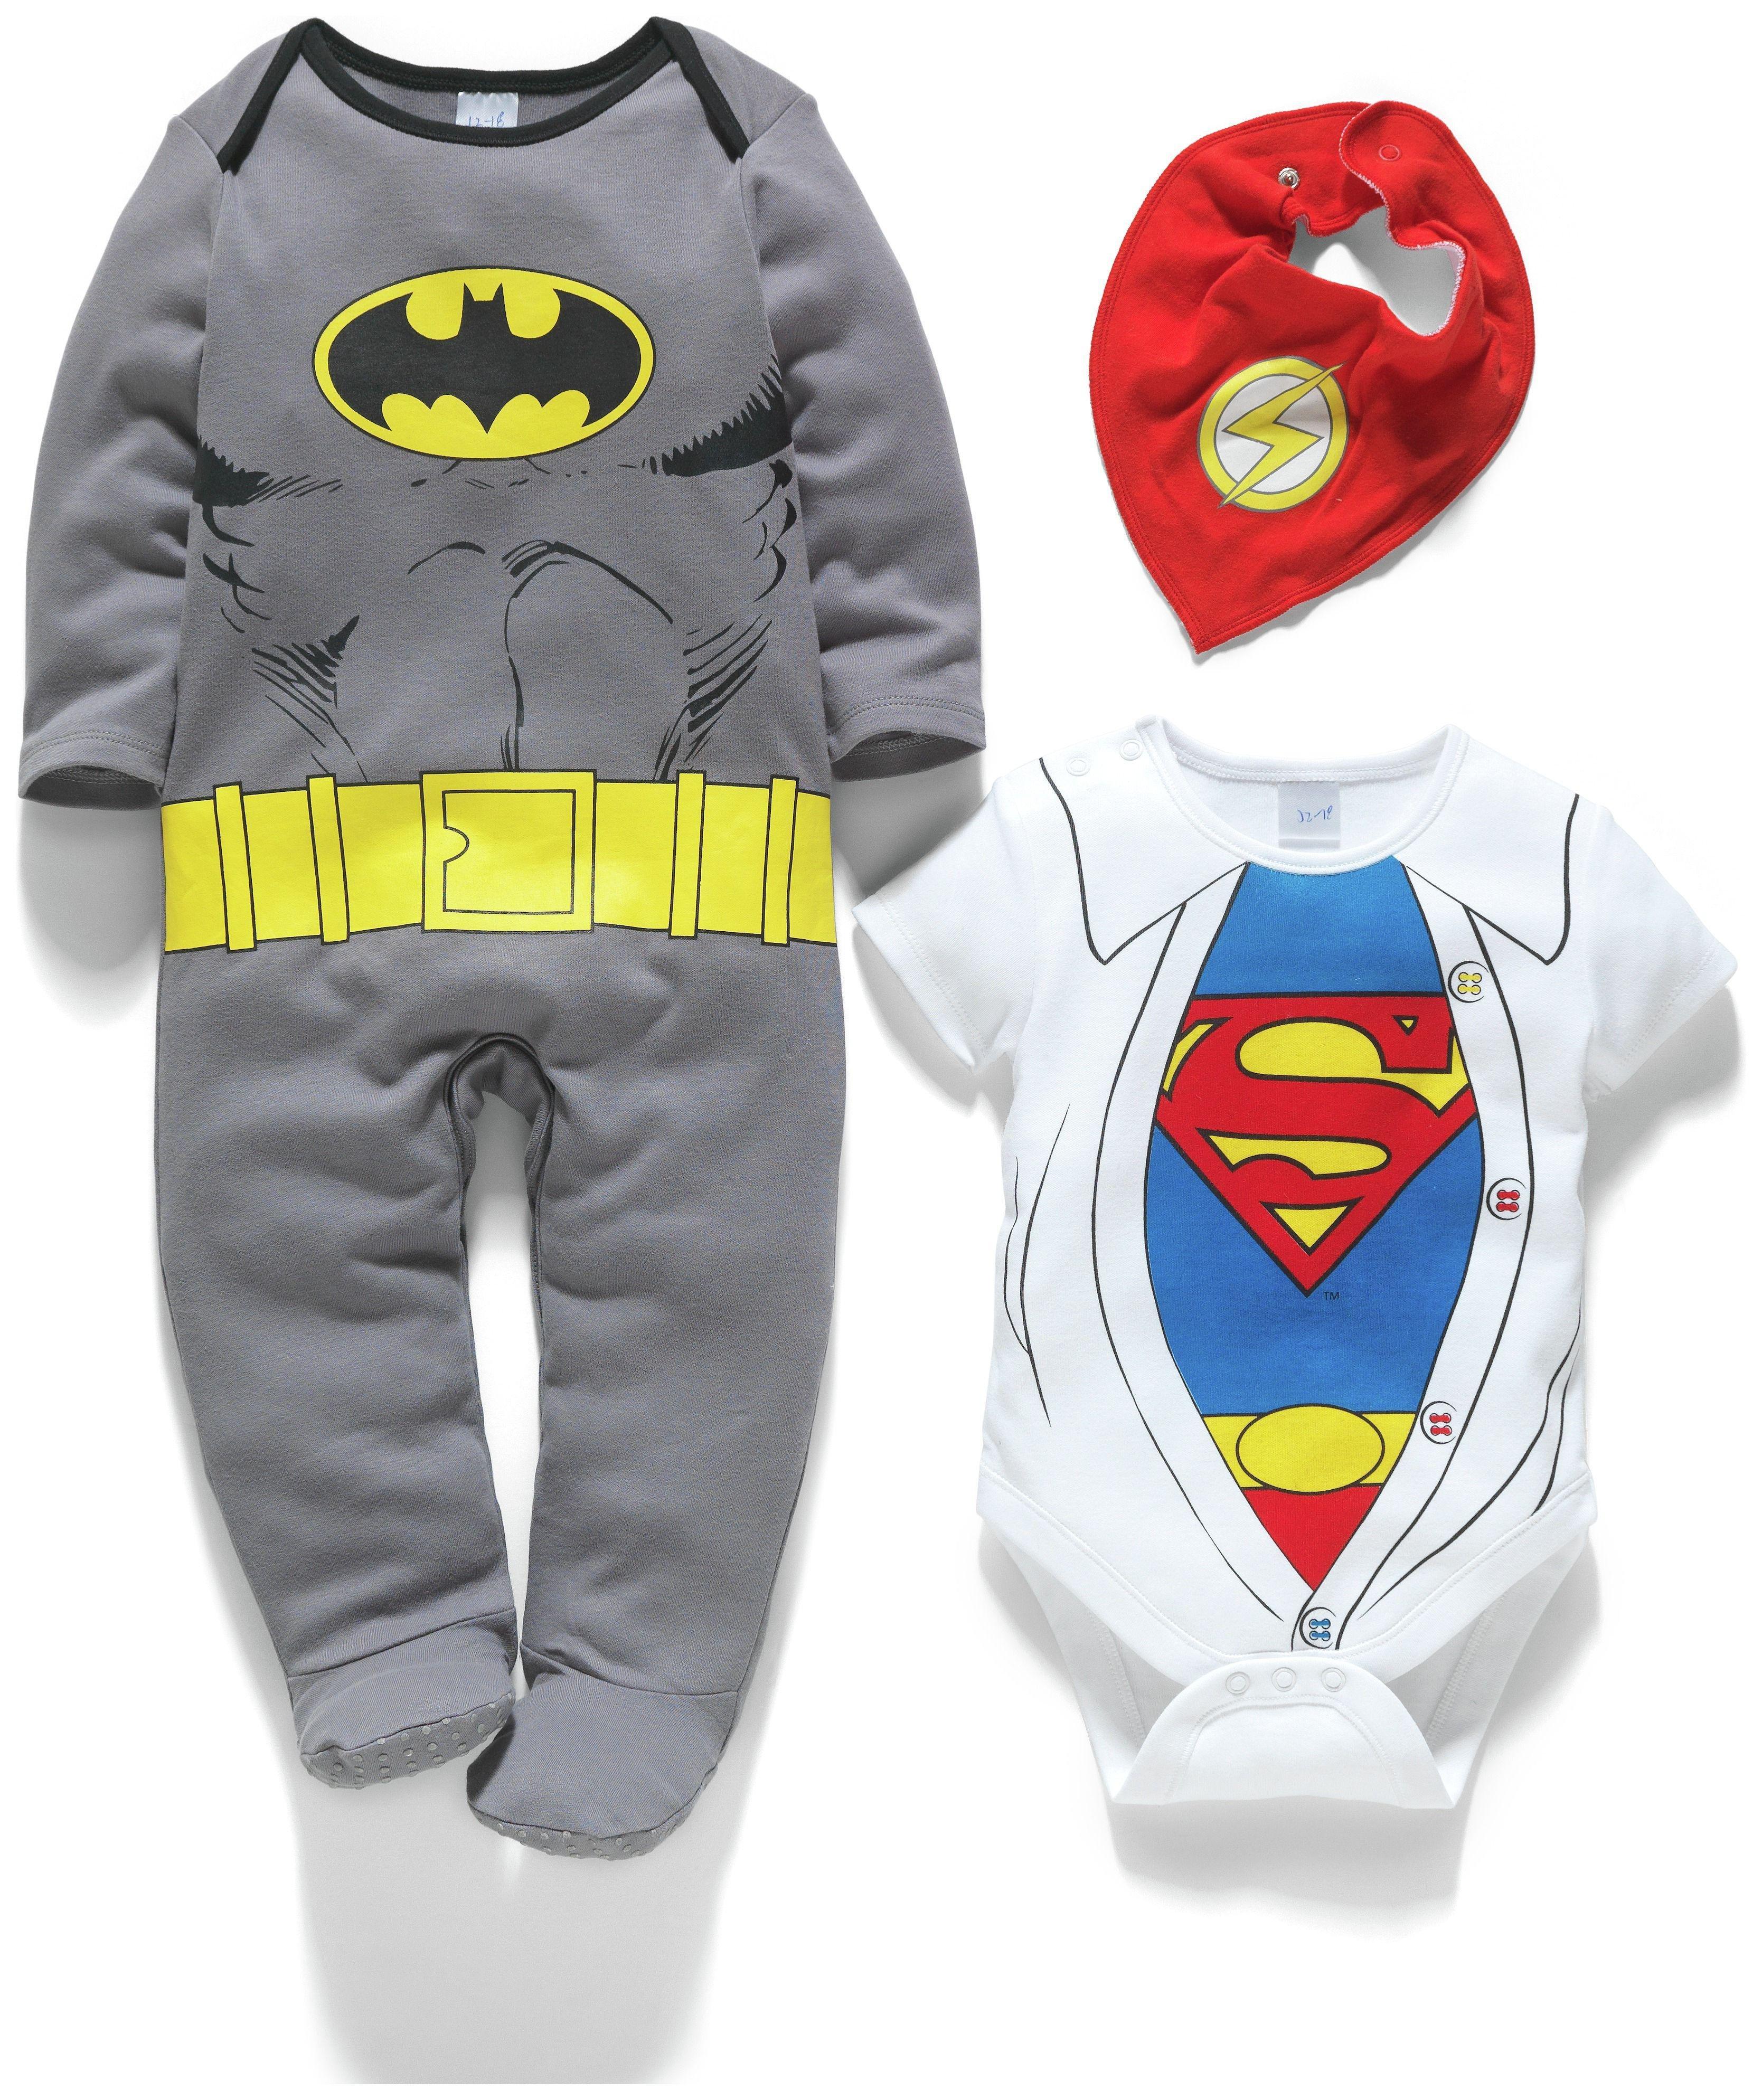 Image of Batman, Superman, Flash 3 Piece Baby Gift Set - 0-3 Months